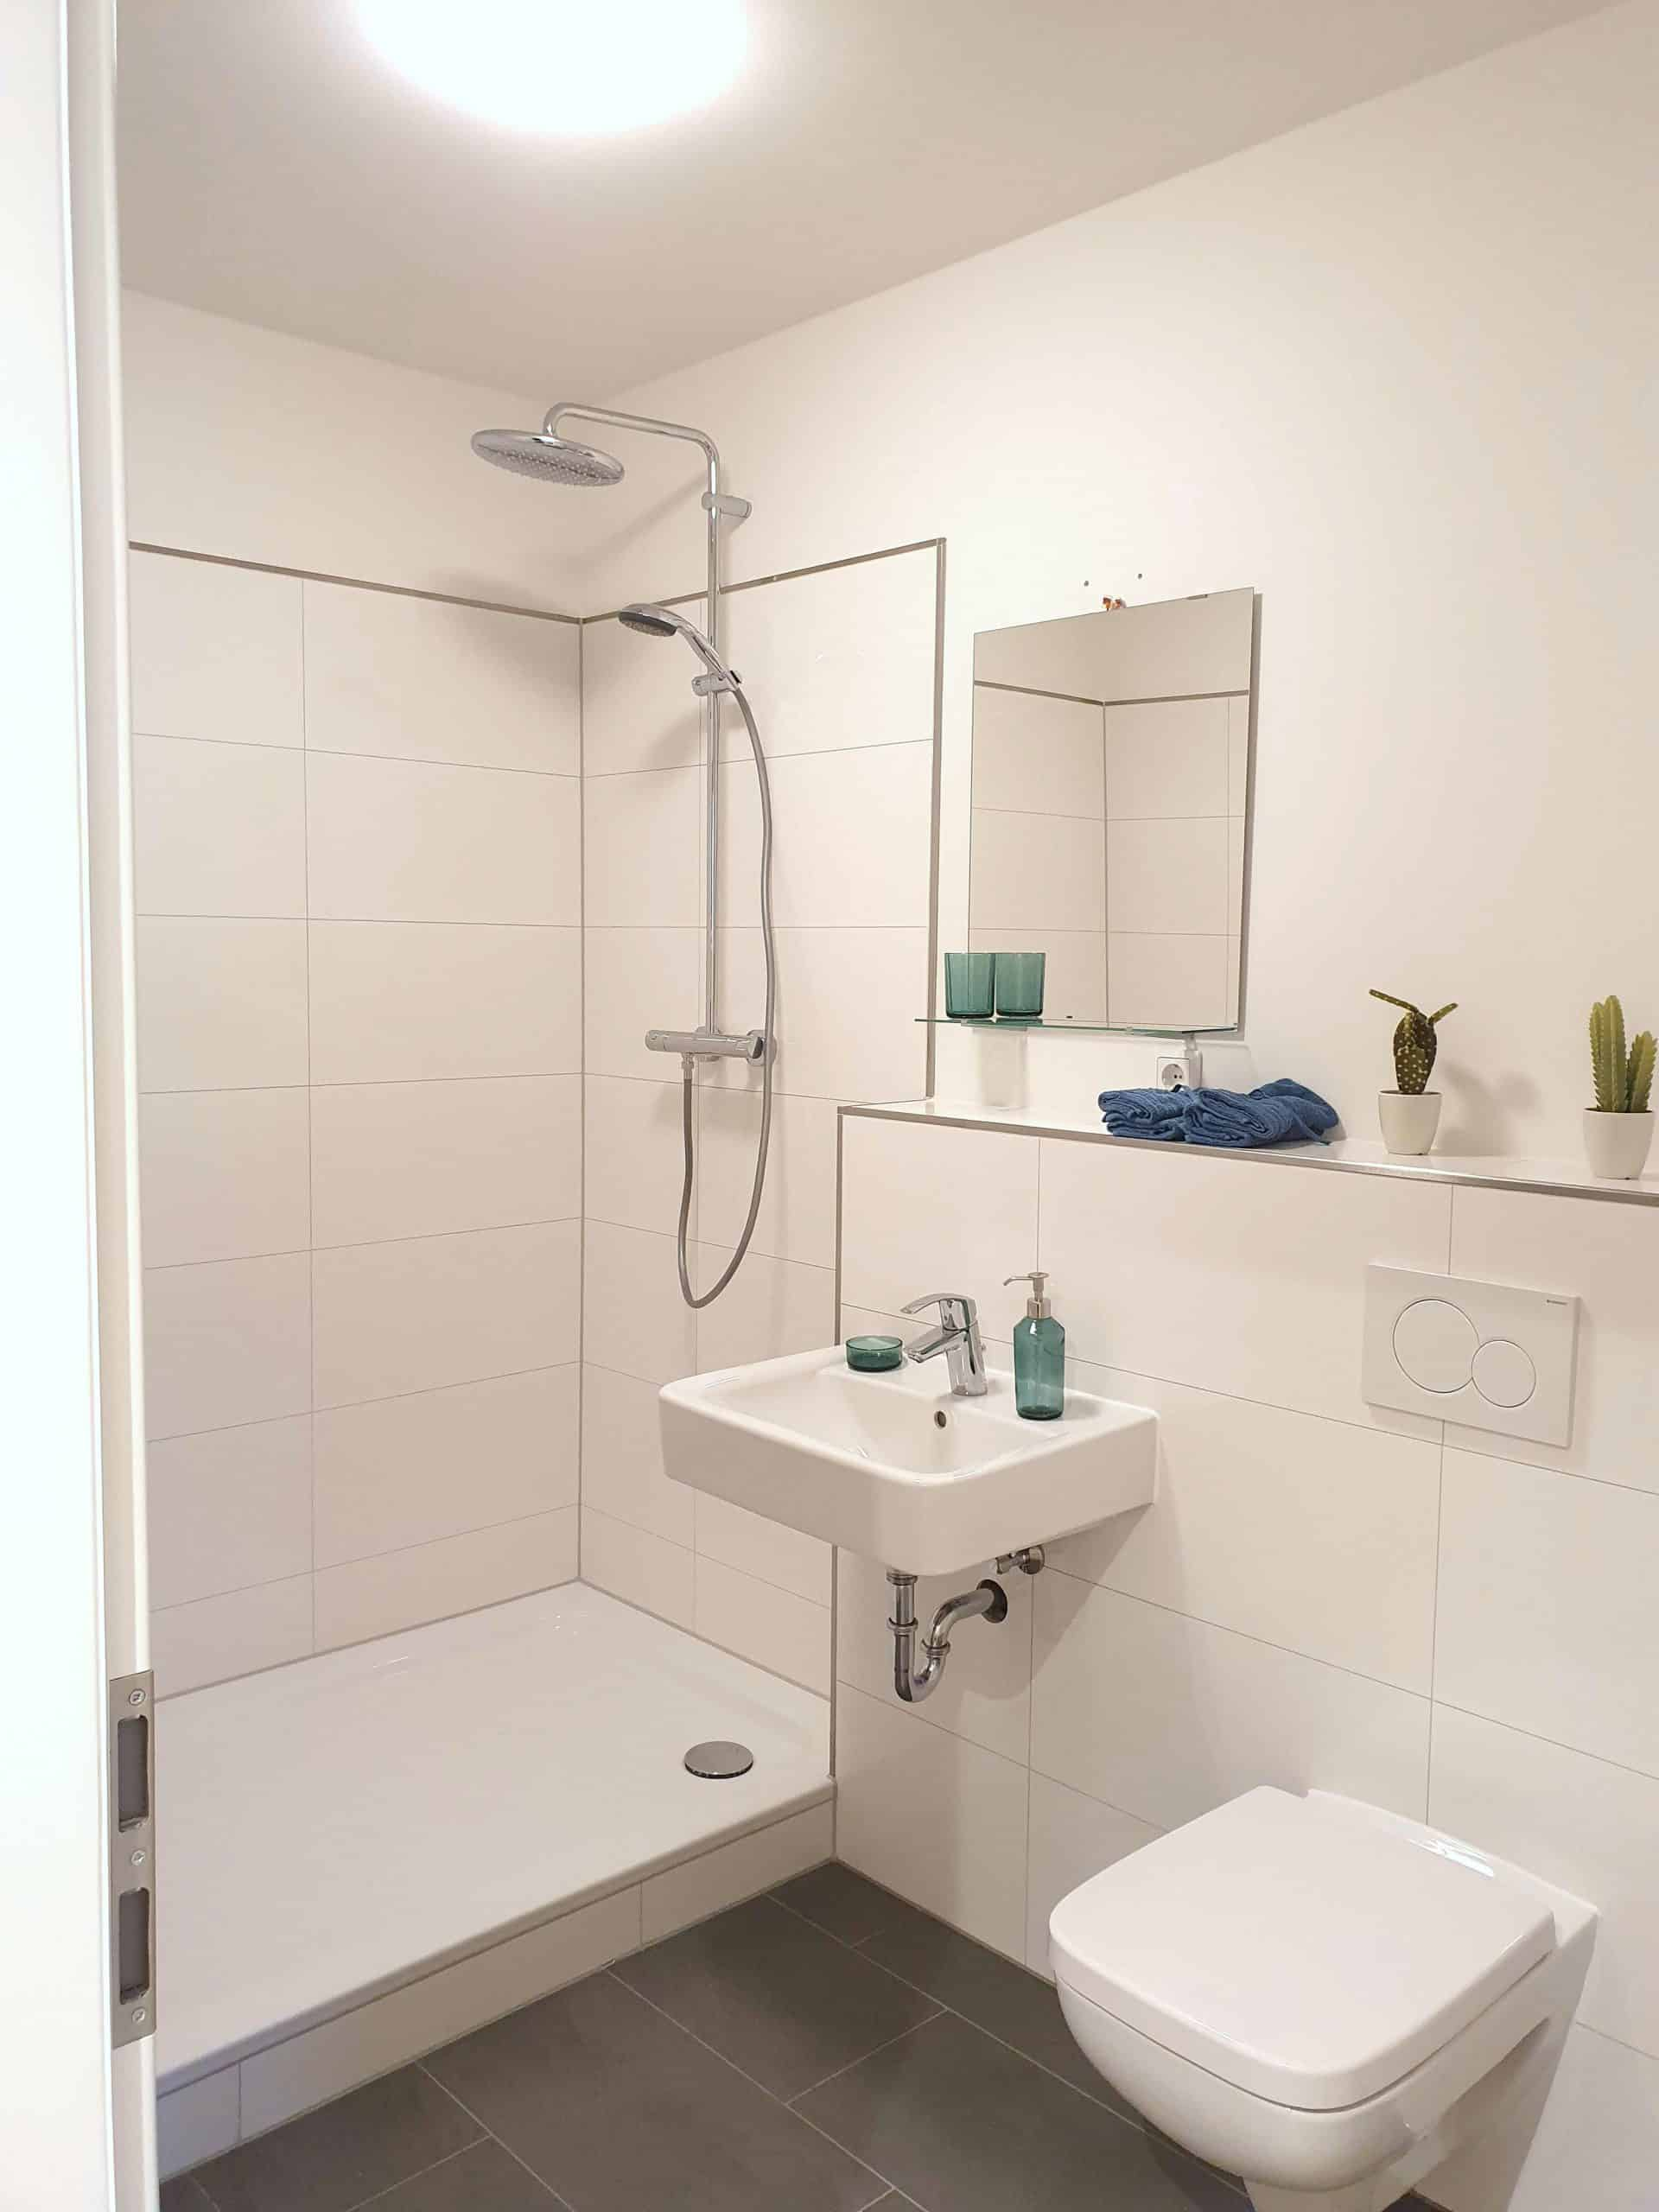 Provisionsfrei: 1 Zimmer Wohnung nahe UKE, Badezimmer